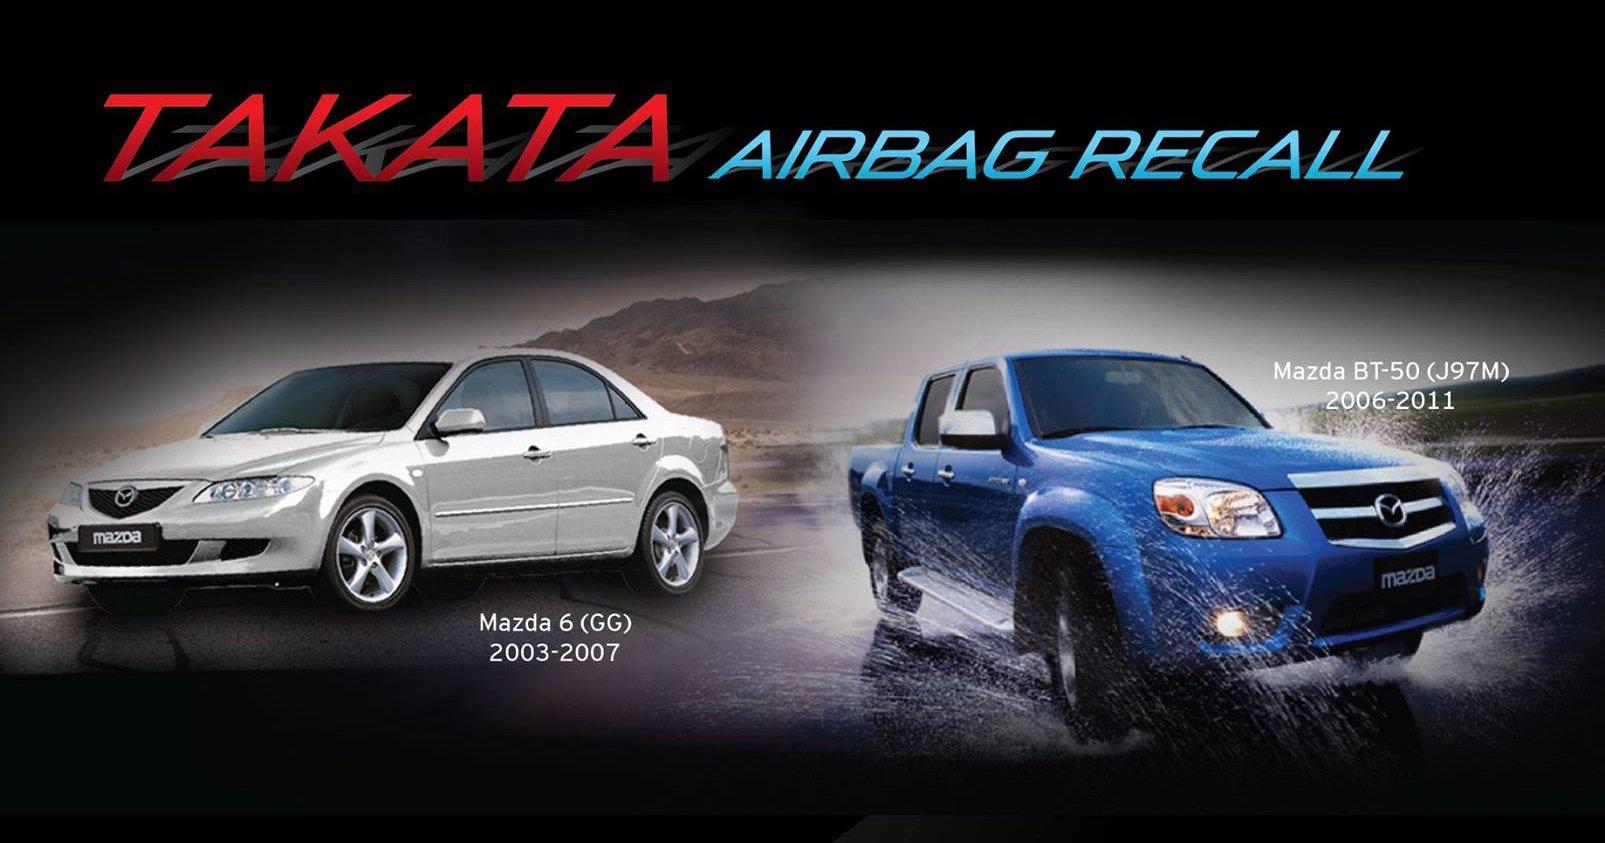 Mazda Malaysia Announces Recall For Mazda 6 Bt 50